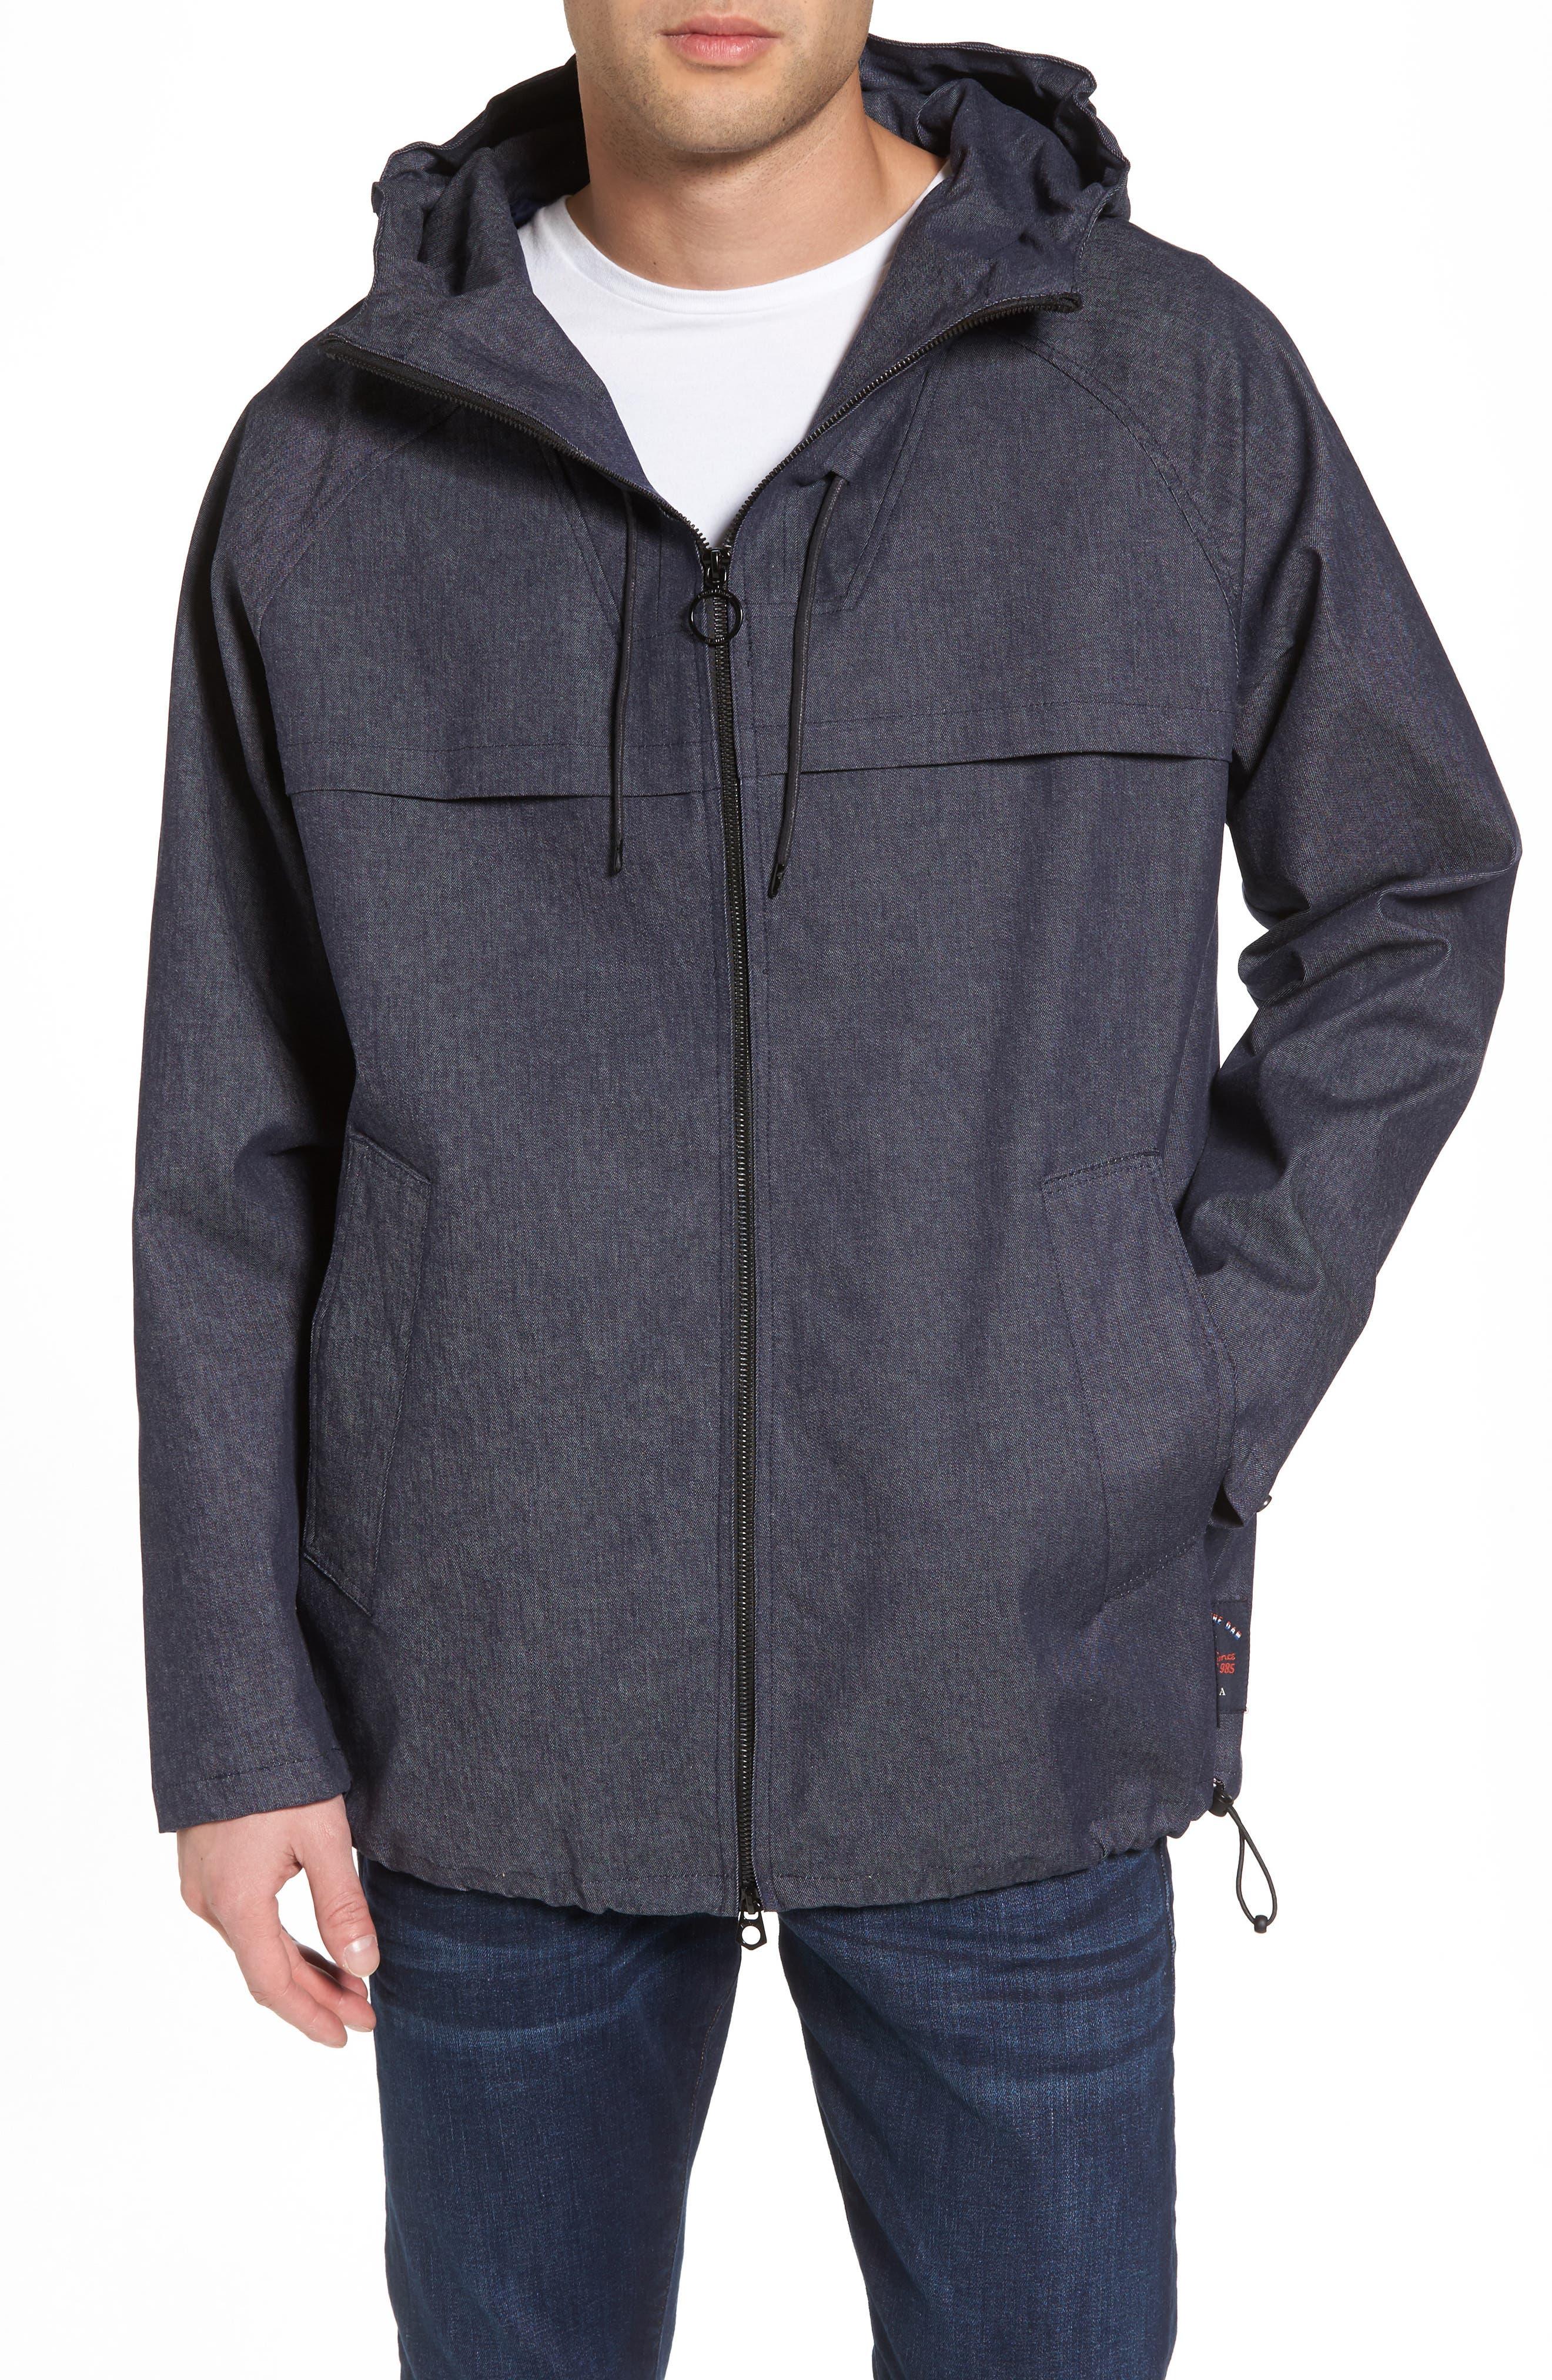 SCOTCH & SODA Denim Jacket, Main, color, 410